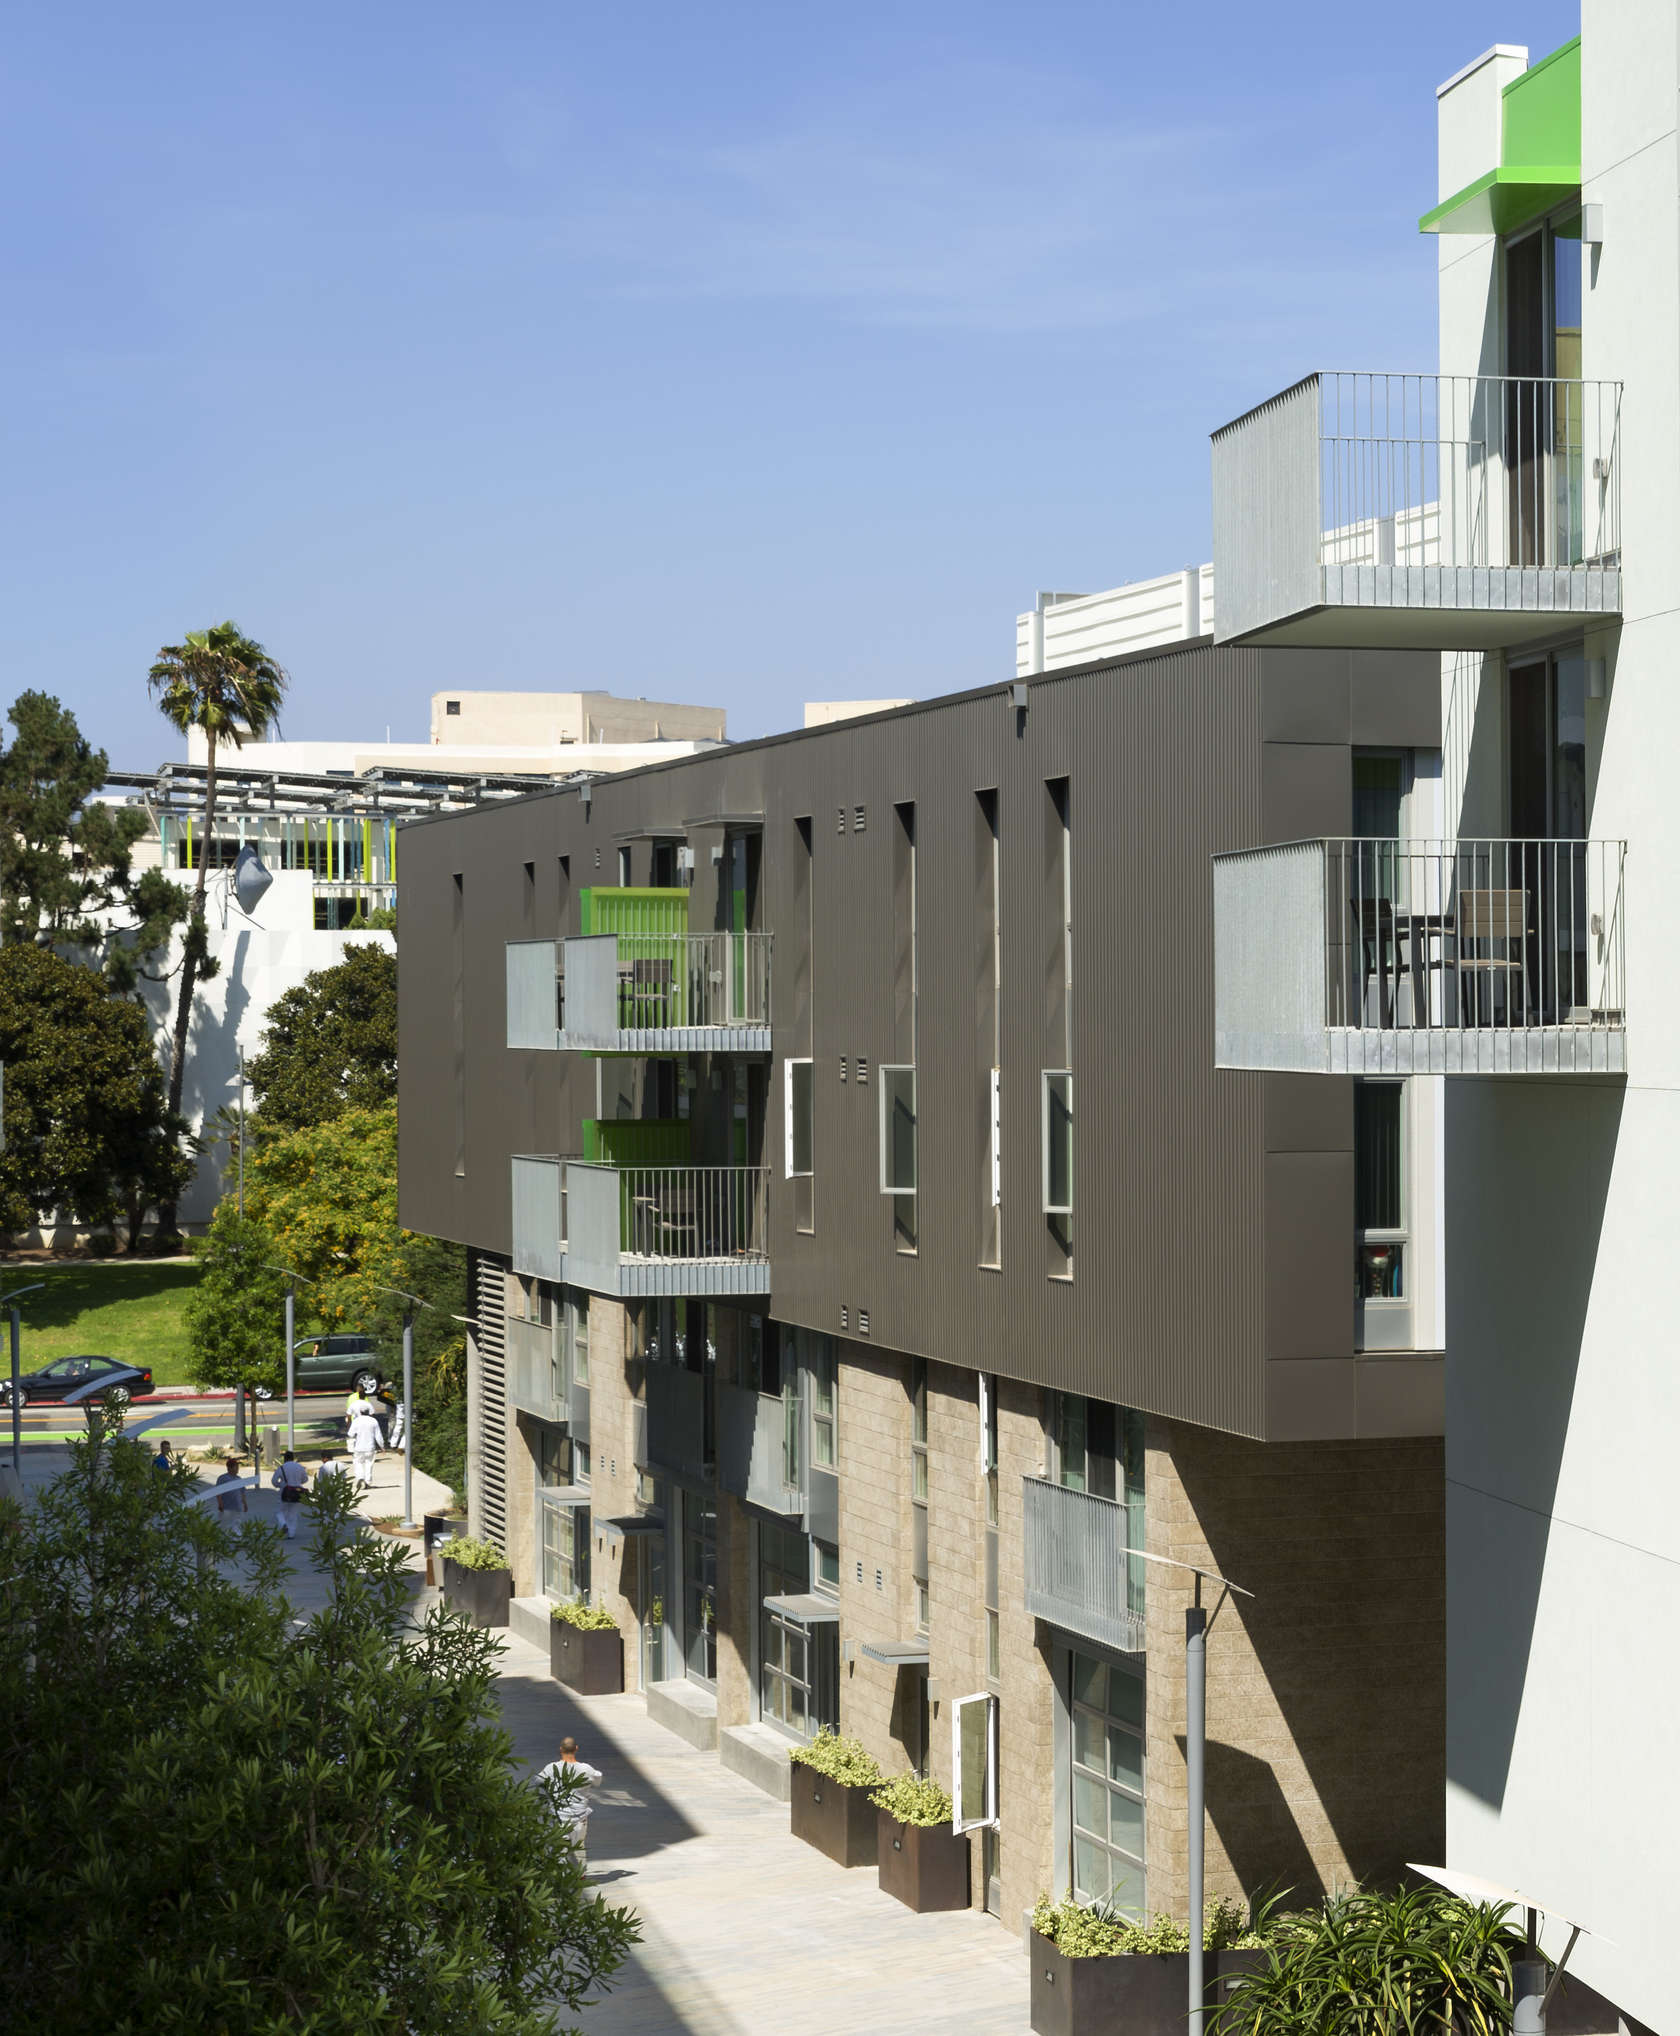 Cheap Apt: Belmar Affordable Apartments